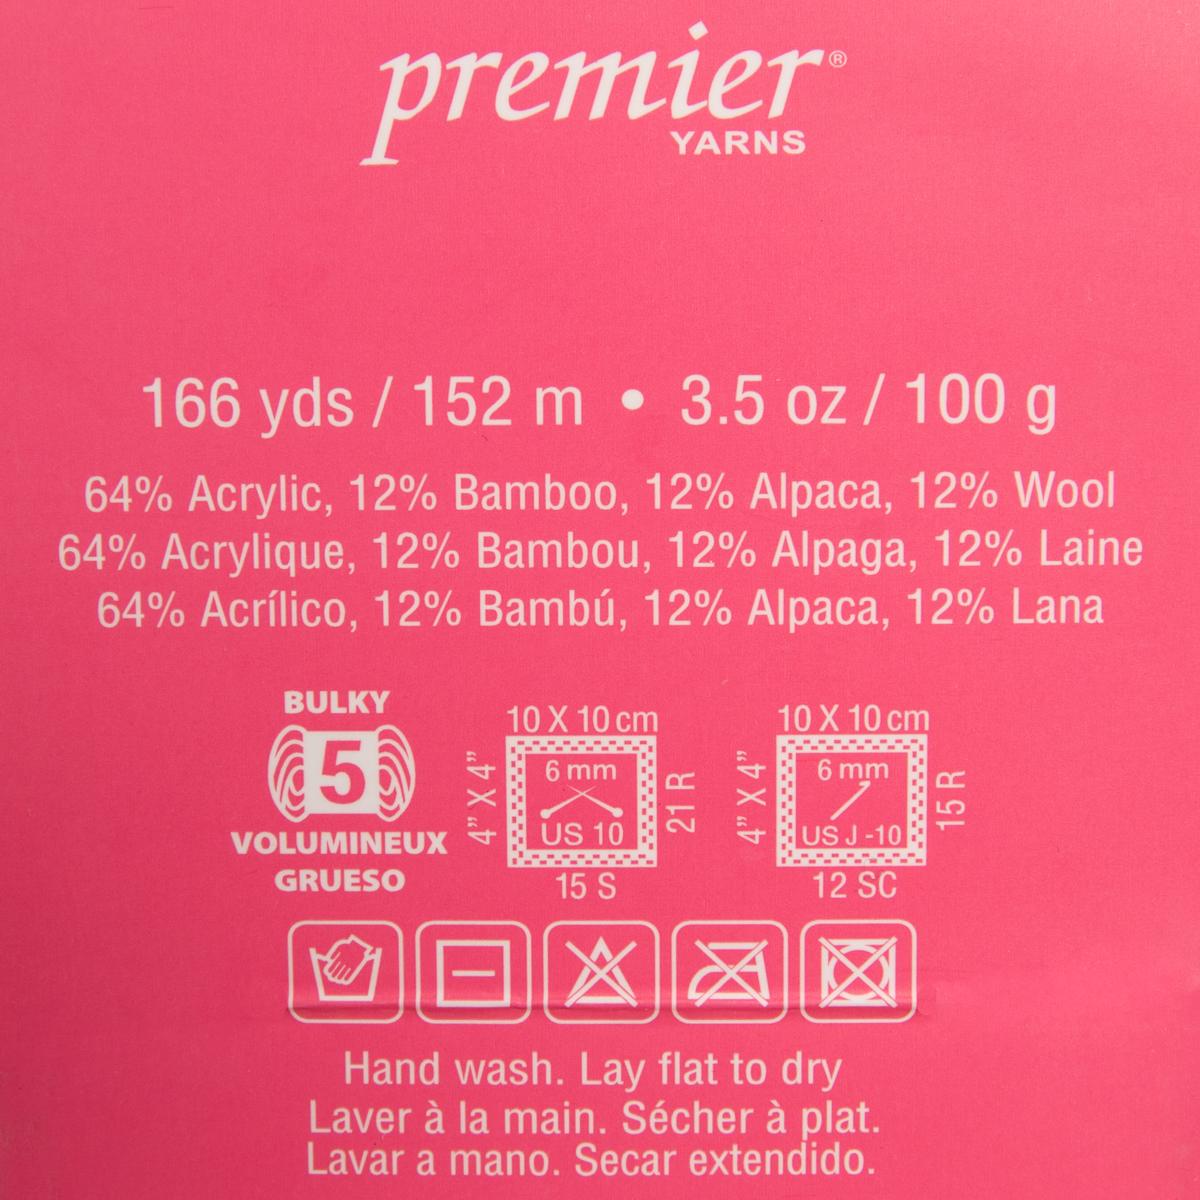 3pk-Premier-Yarn-Isaac-Mizrahi-NY-Skyscraper-Acrylic-Blend-Yarn-5-Bulky-Skeins thumbnail 12